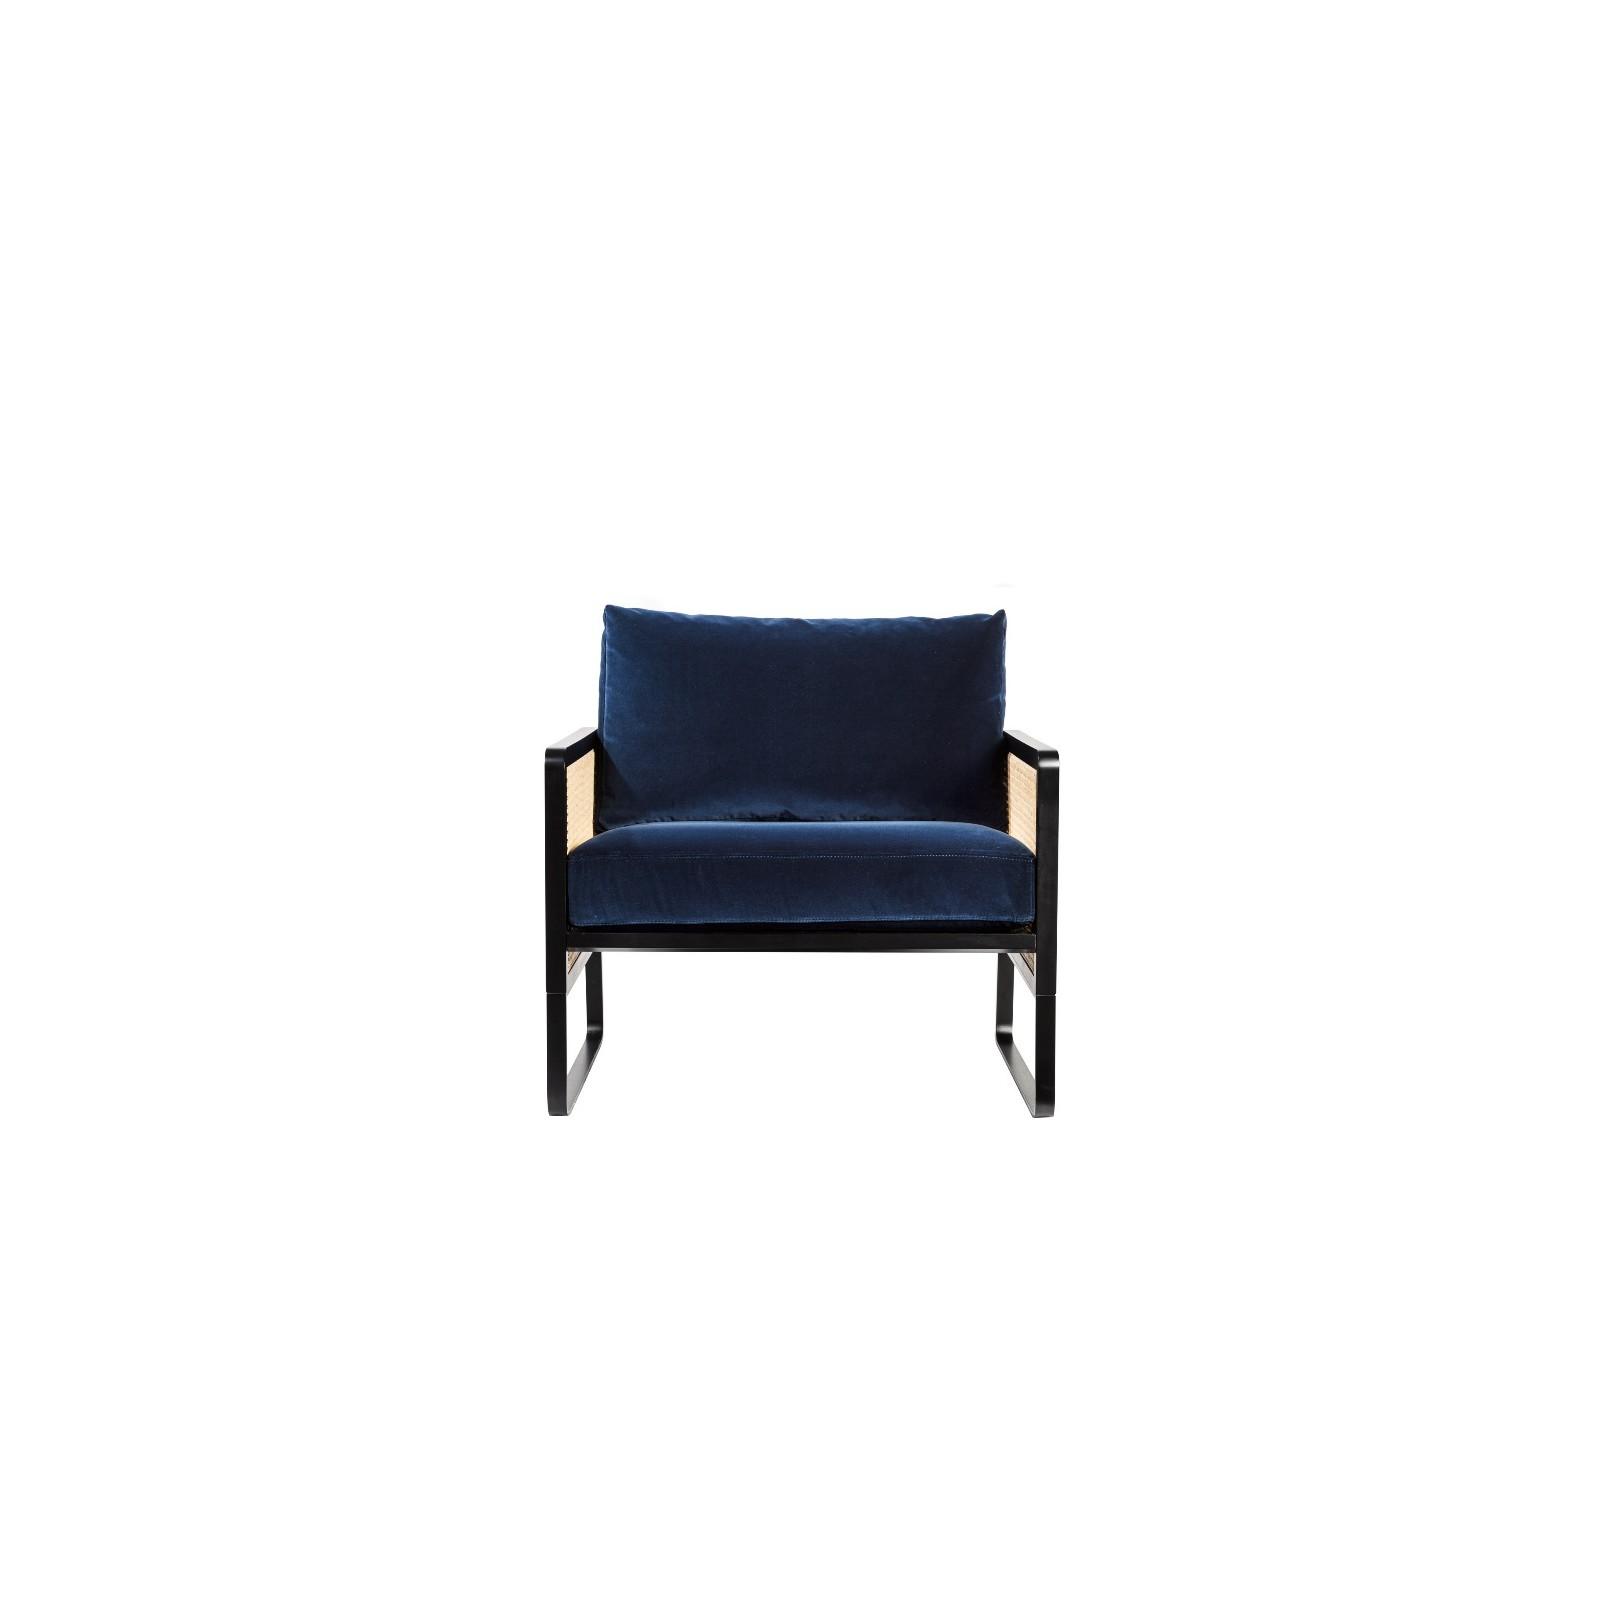 fauteuil cannage velours bleu marine arne concept. Black Bedroom Furniture Sets. Home Design Ideas